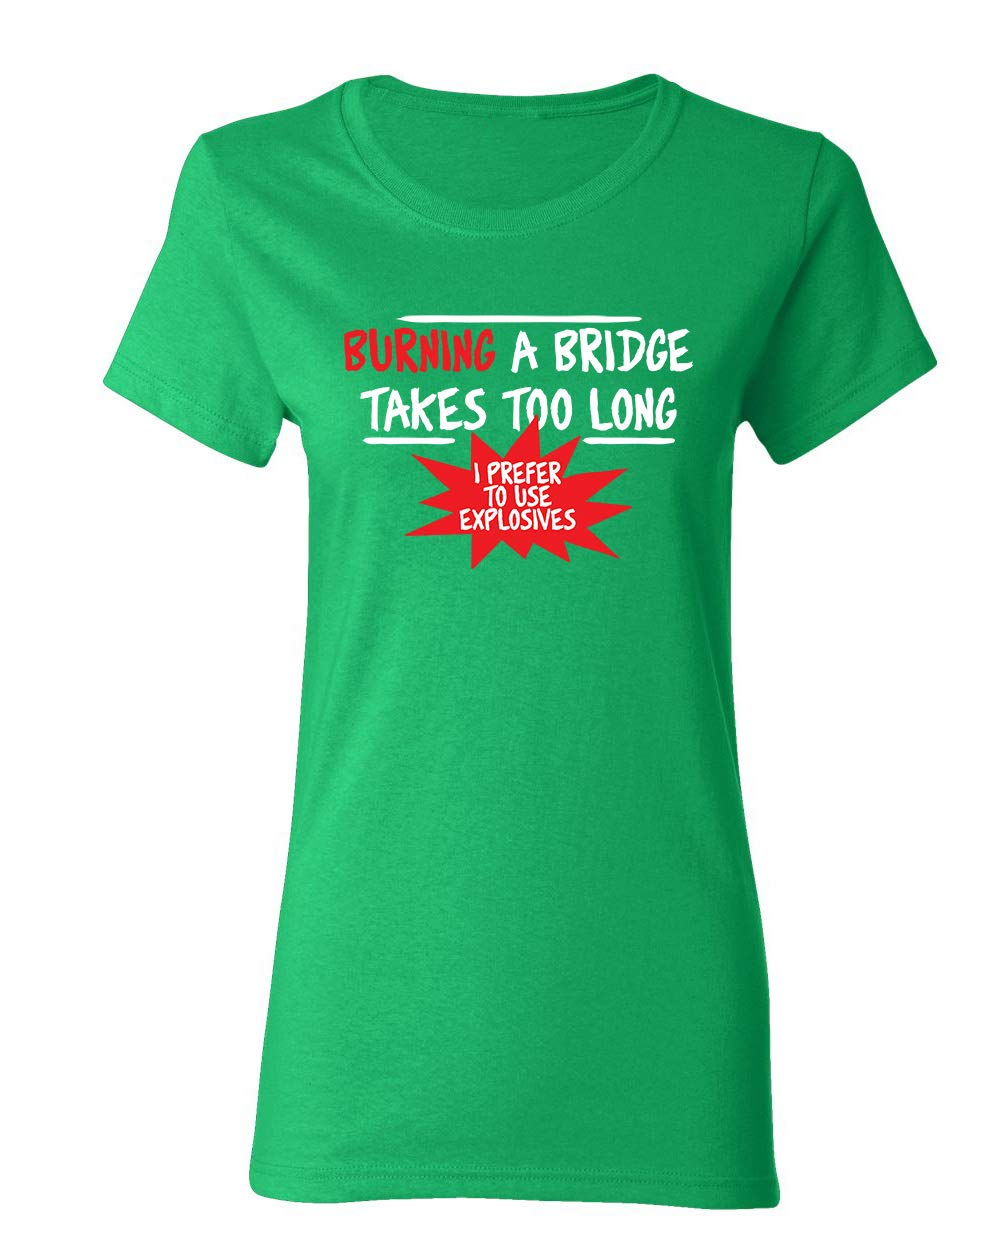 Burning A Bridge Sarcastic Graphic Funny T Shirt 3894